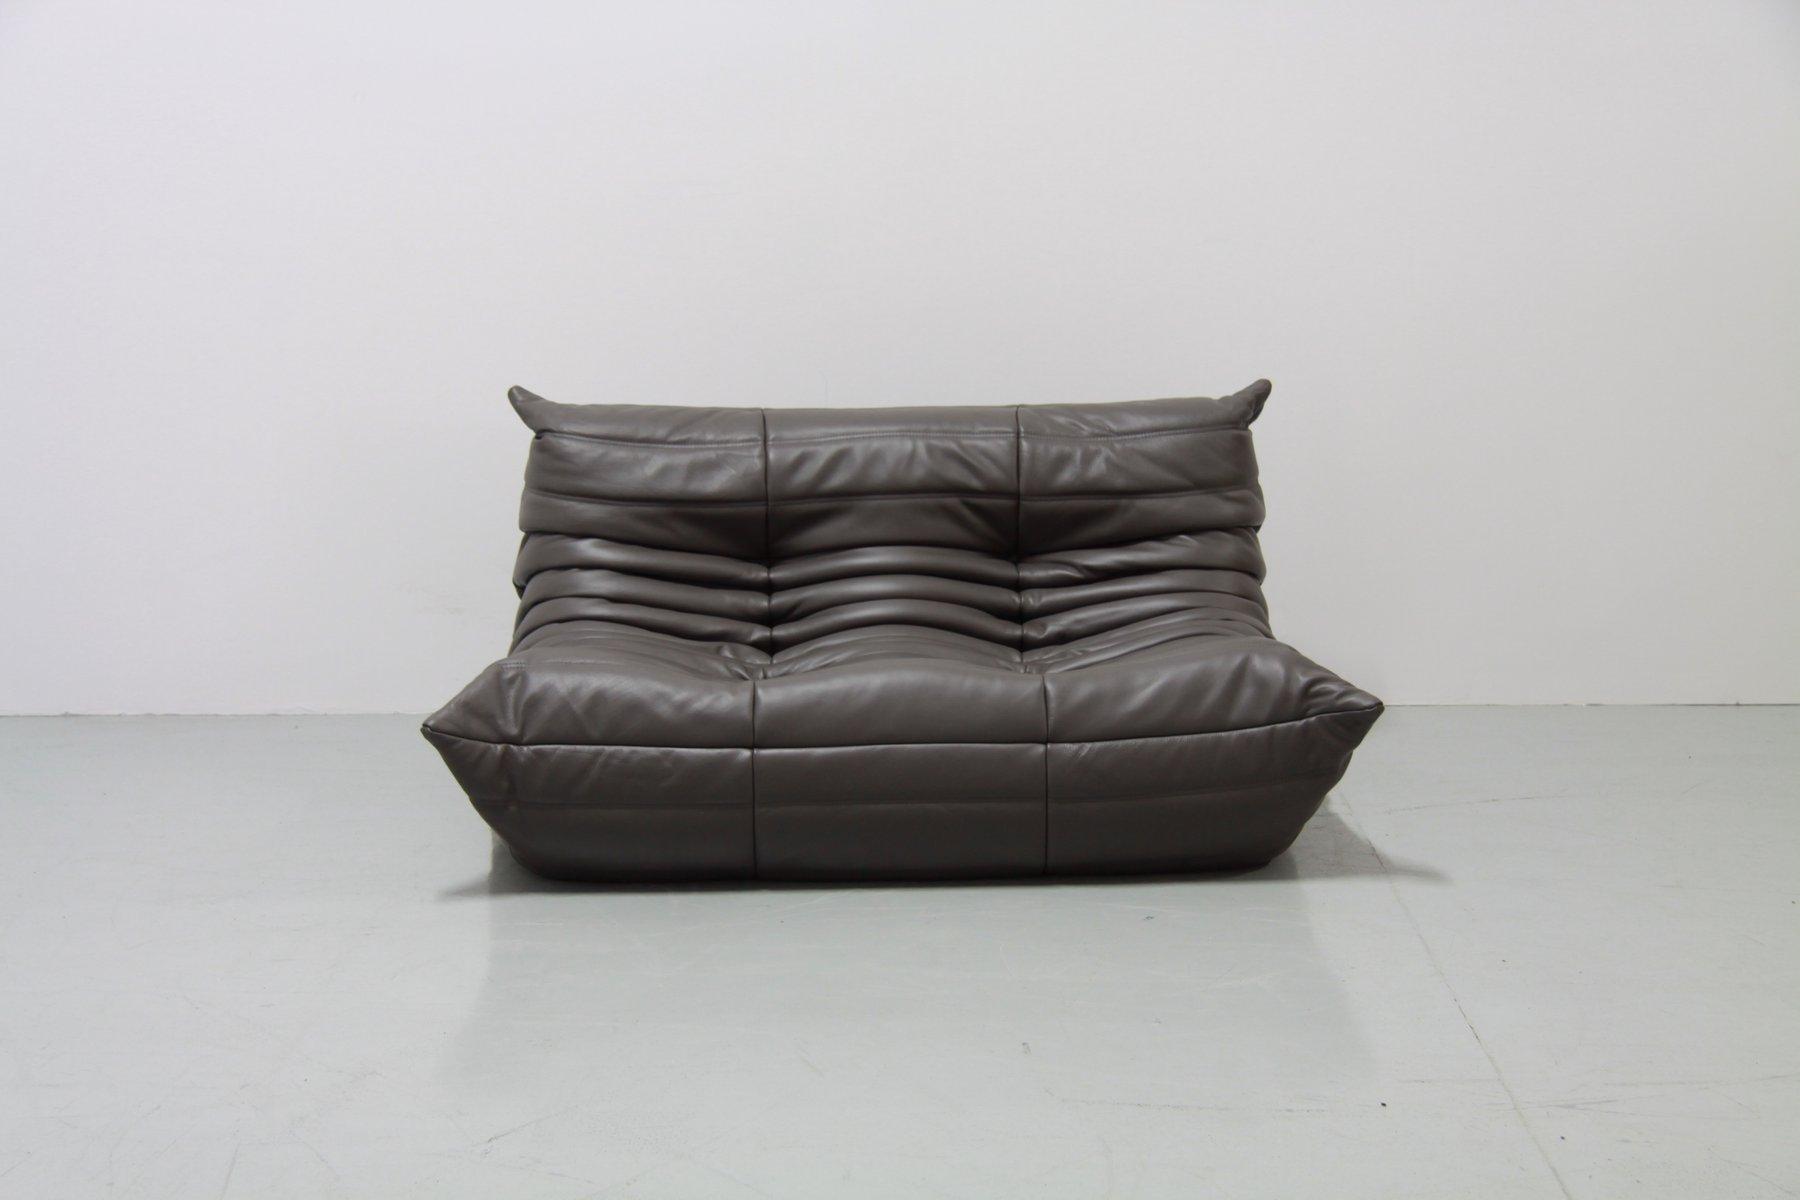 vintage graphit togo ledersofa set von michel ducaroy f r ligne roset 1970er bei pamono kaufen. Black Bedroom Furniture Sets. Home Design Ideas